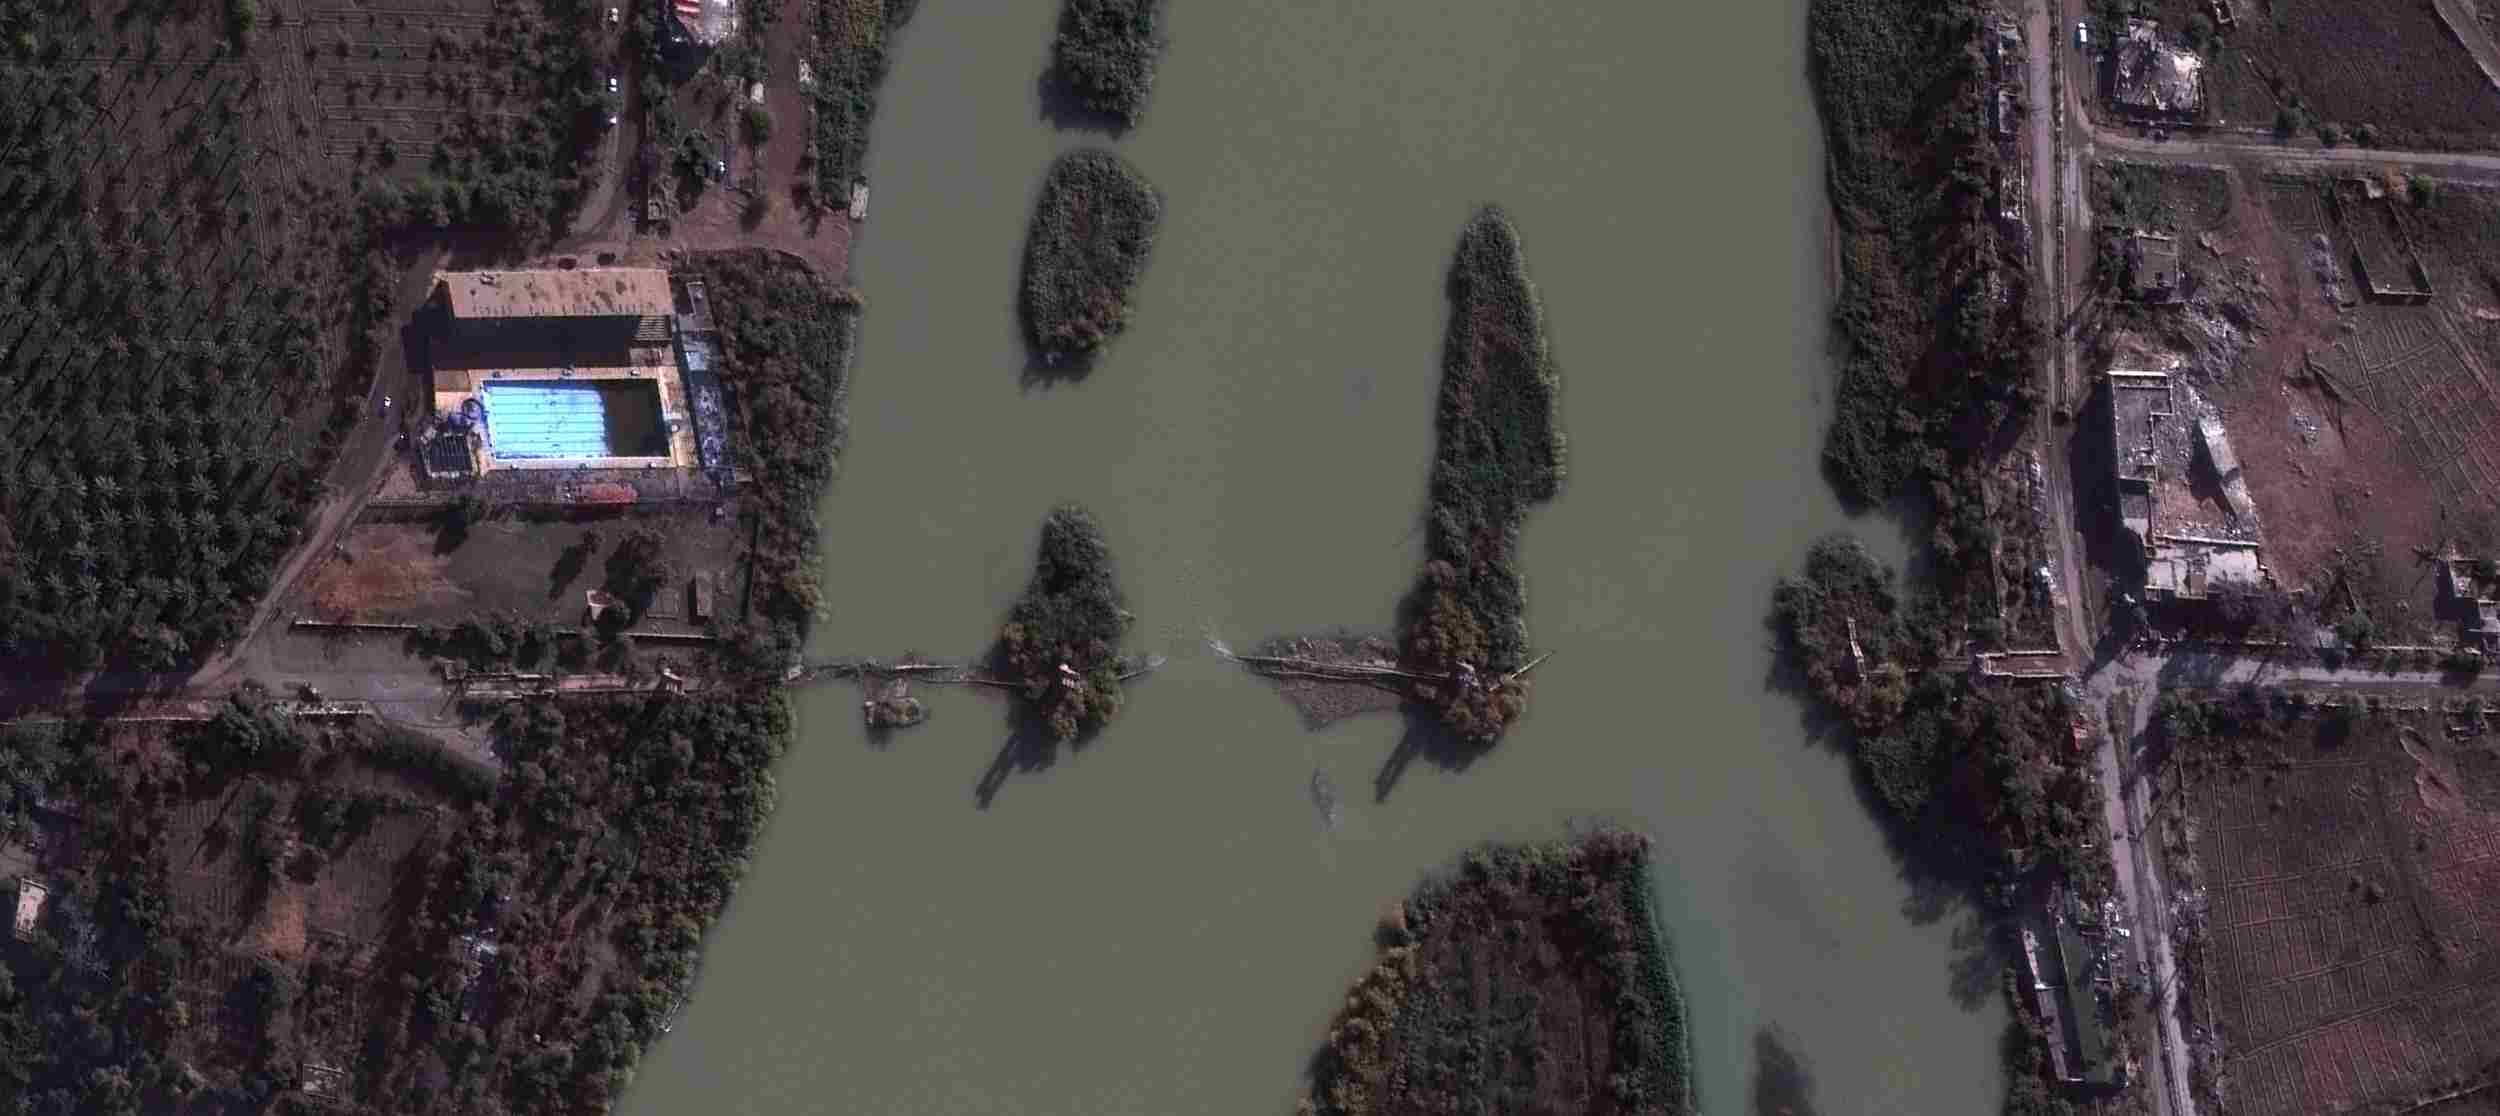 UNOSAT_Deir ez Zor_SY_Suspended_Bridge_Post_WV03_20141125.jpg